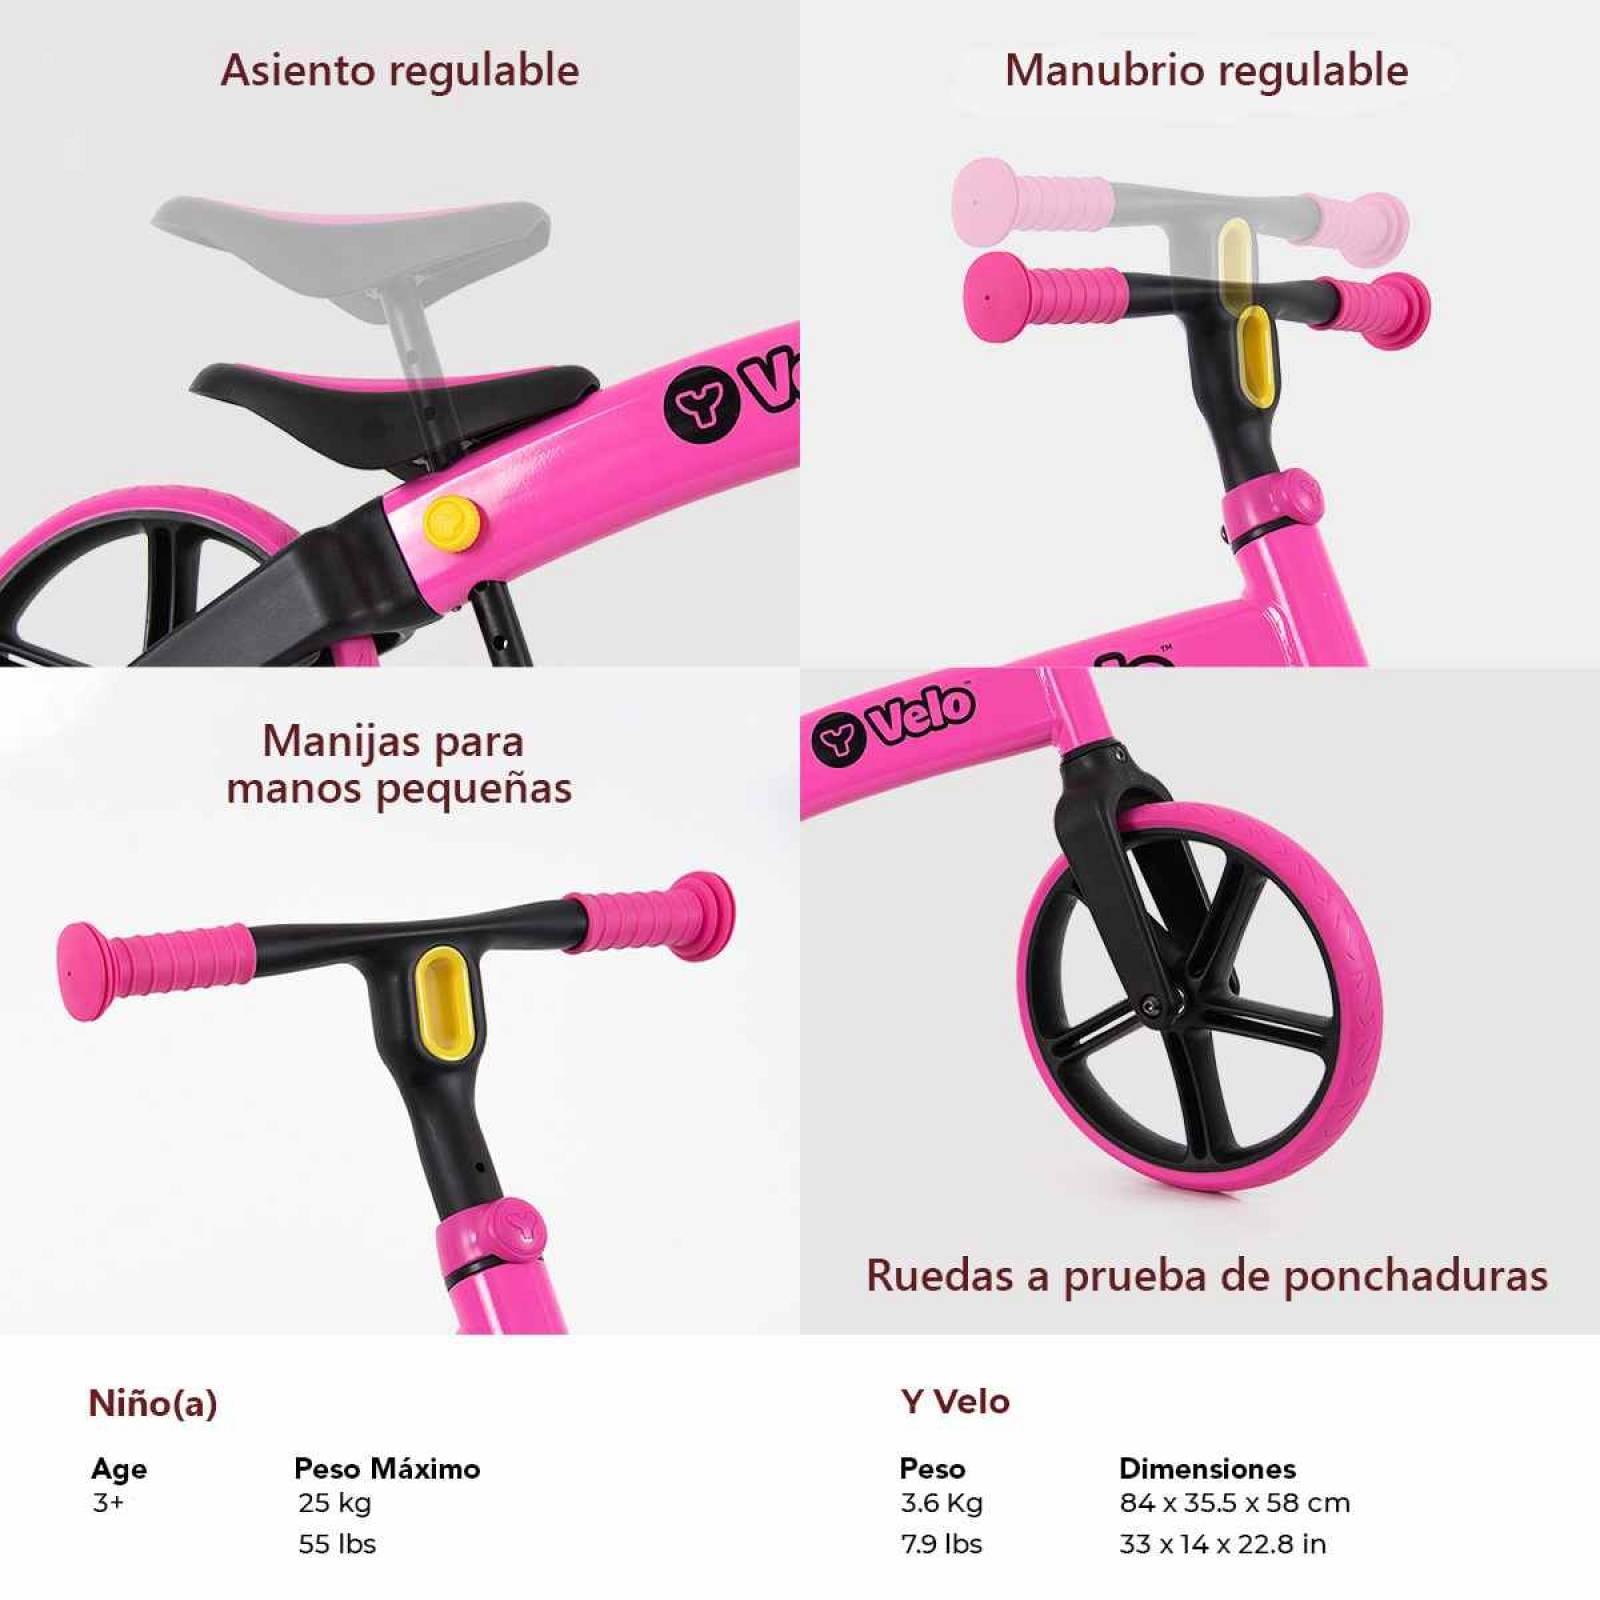 Y Velo Senior Balance Bike  Rosa Neon Color Rosa neon